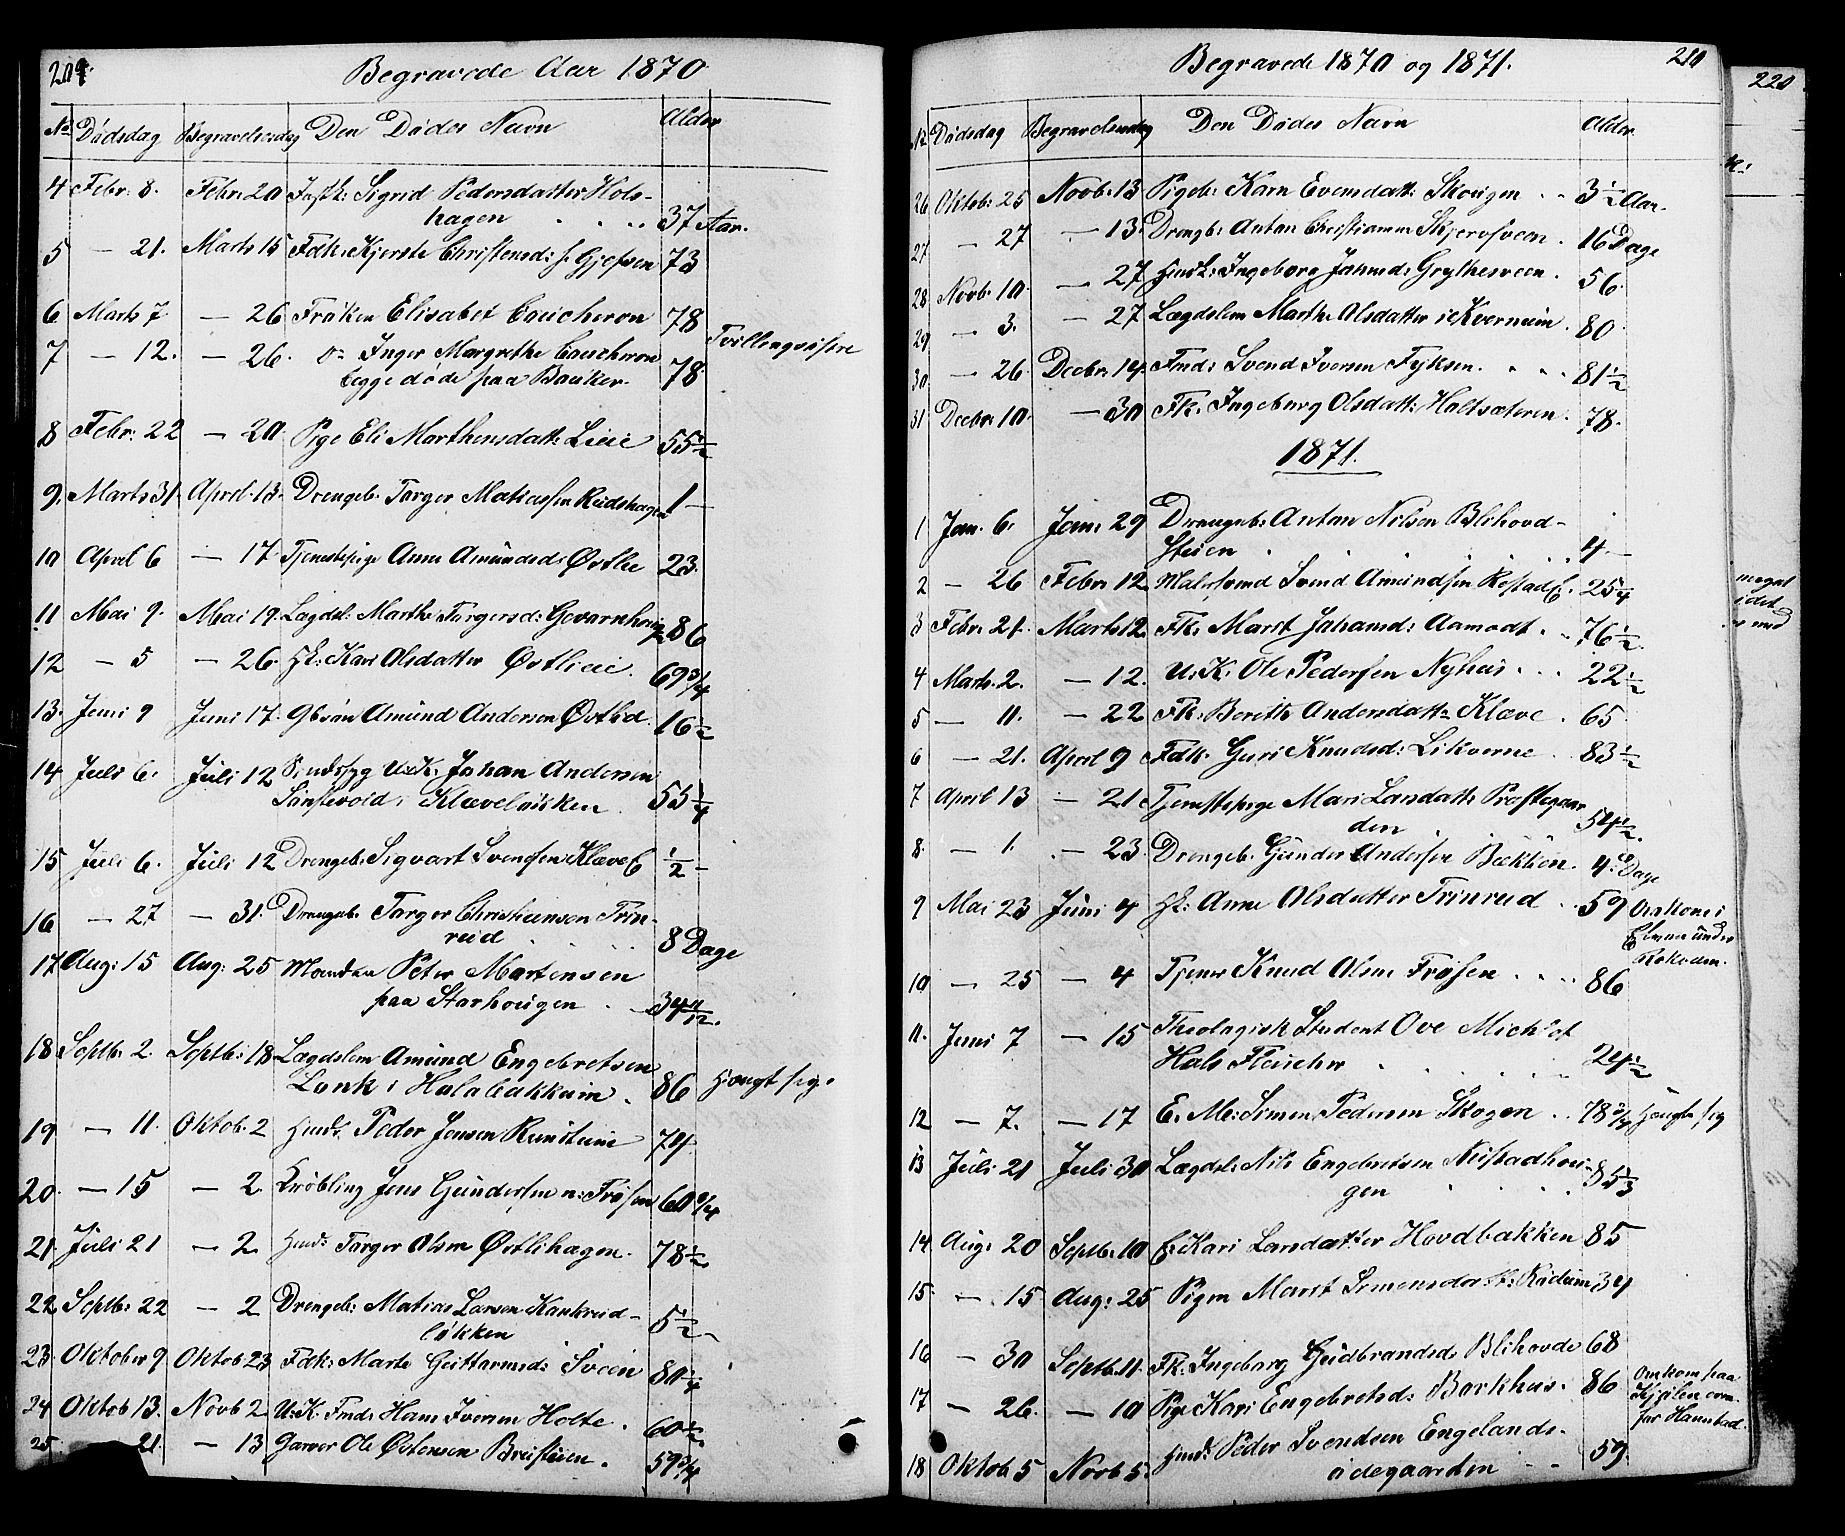 SAH, Østre Gausdal prestekontor, Klokkerbok nr. 1, 1863-1893, s. 209-210